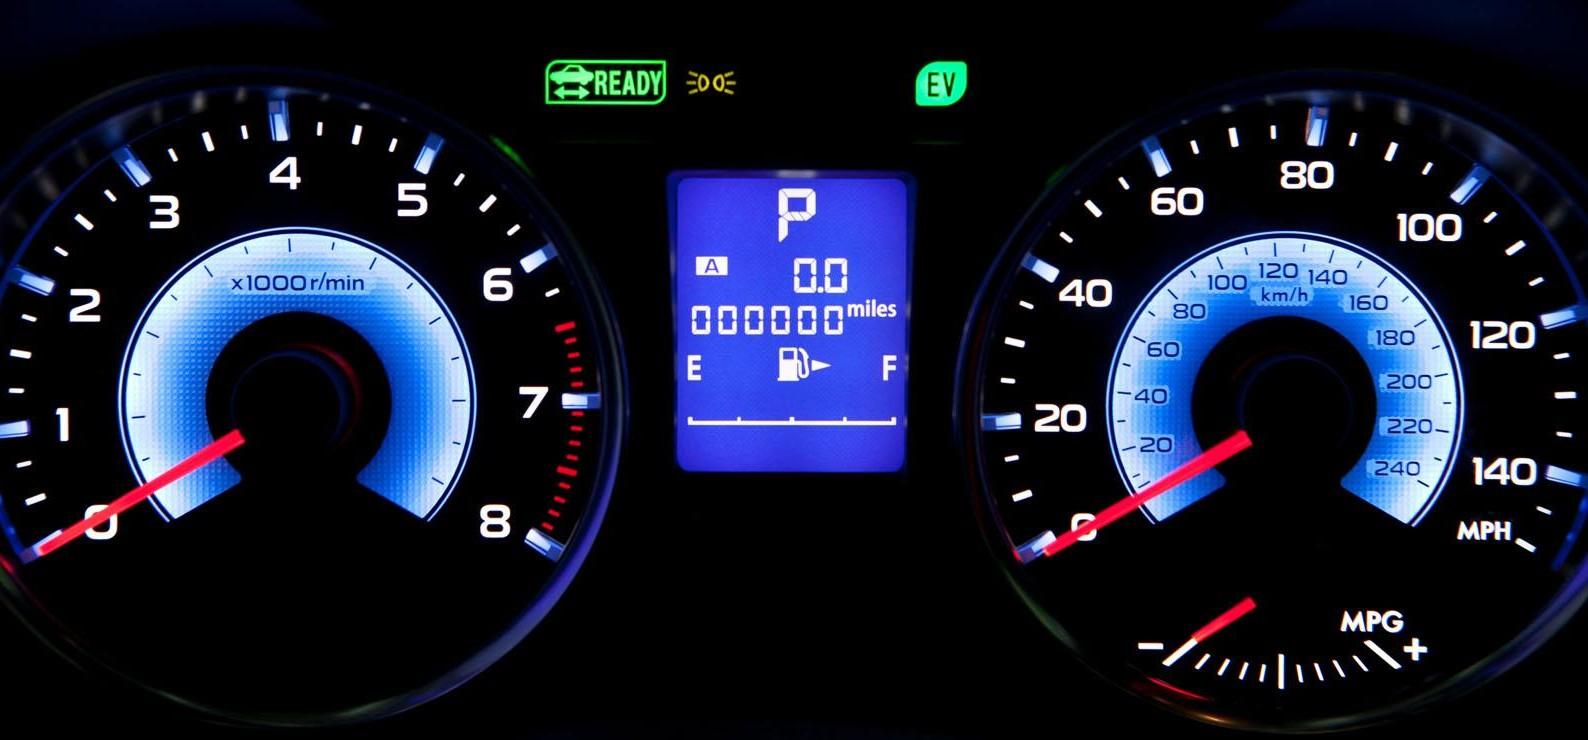 Subaru XV Crosstrek Hybrid unveiled at NYIAS 2013 Paul Tan ...